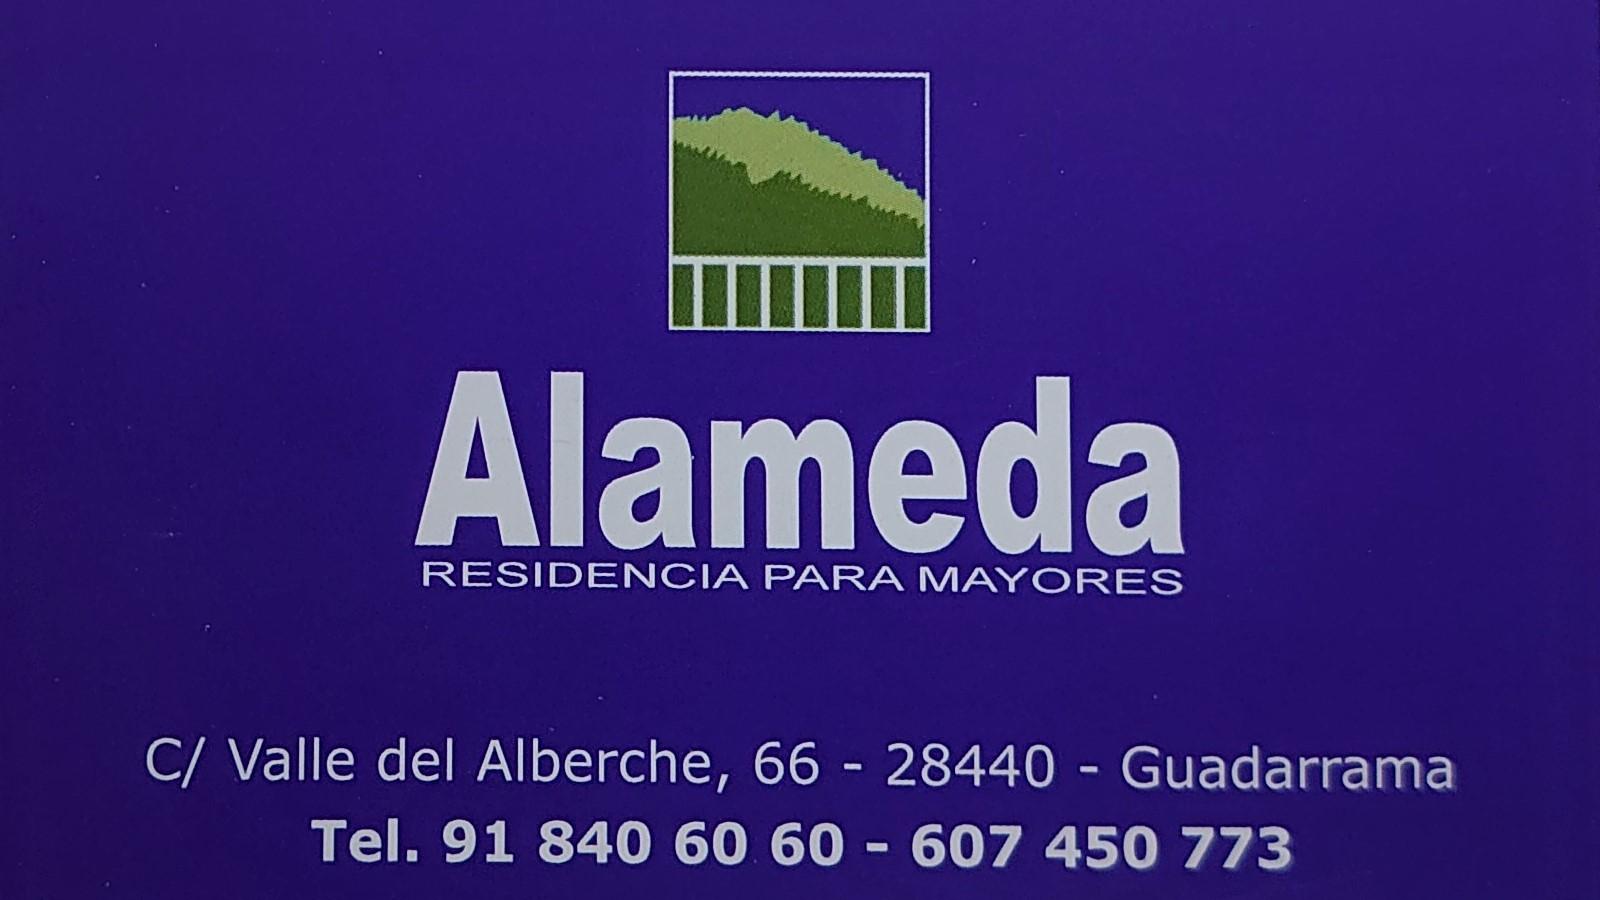 Residencia Alameda